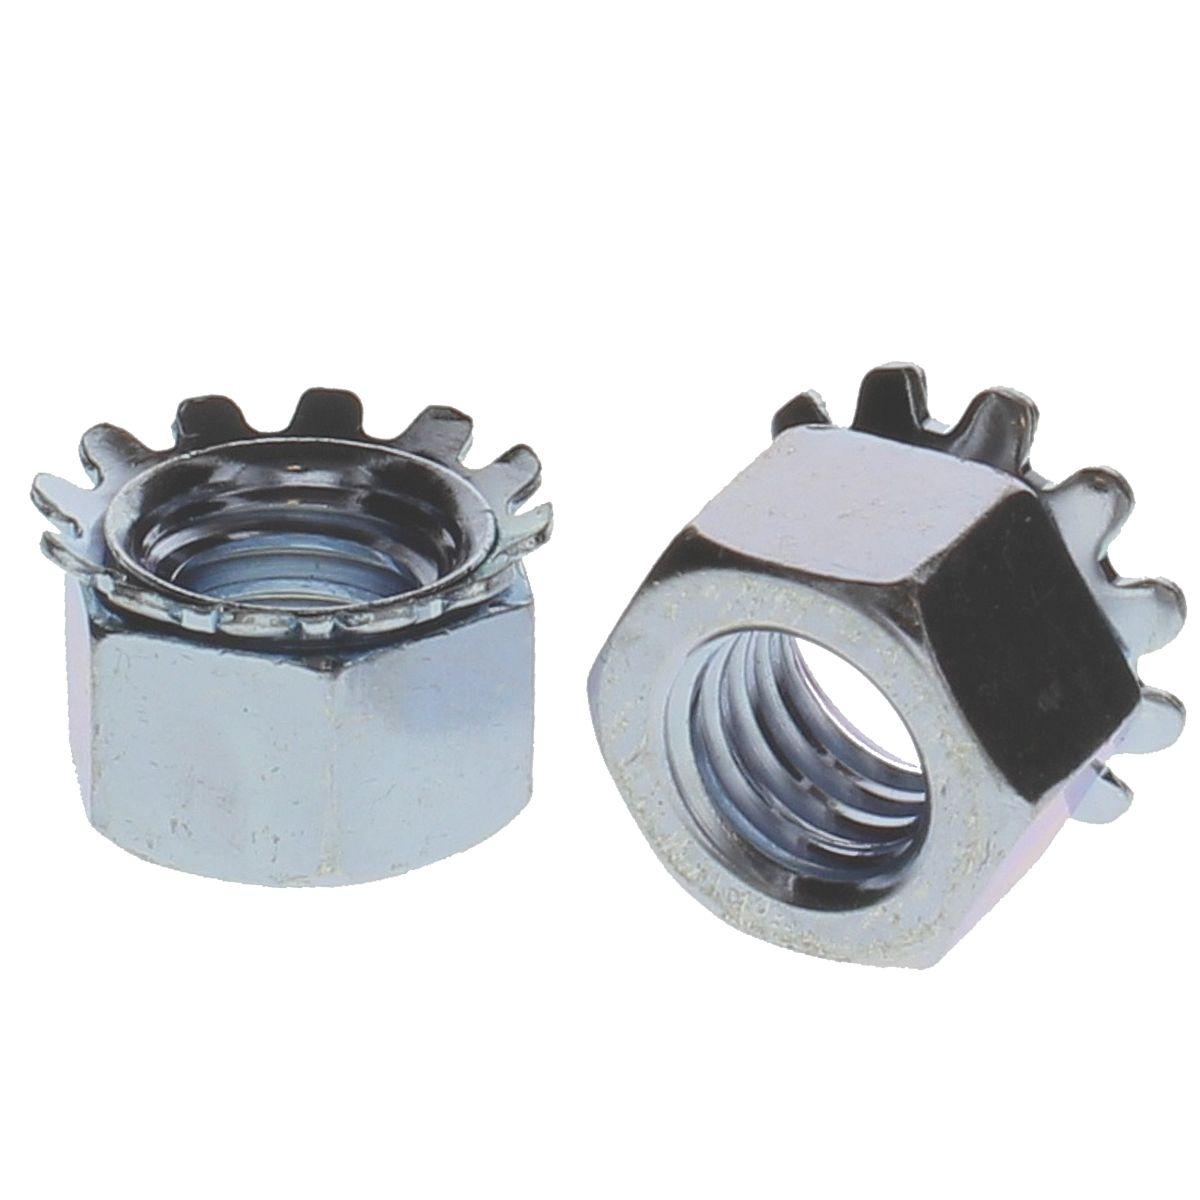 #12-24 Hex Washered Lock Nuts — ASME B1.1, Zinc, Coarse, 100/PKG